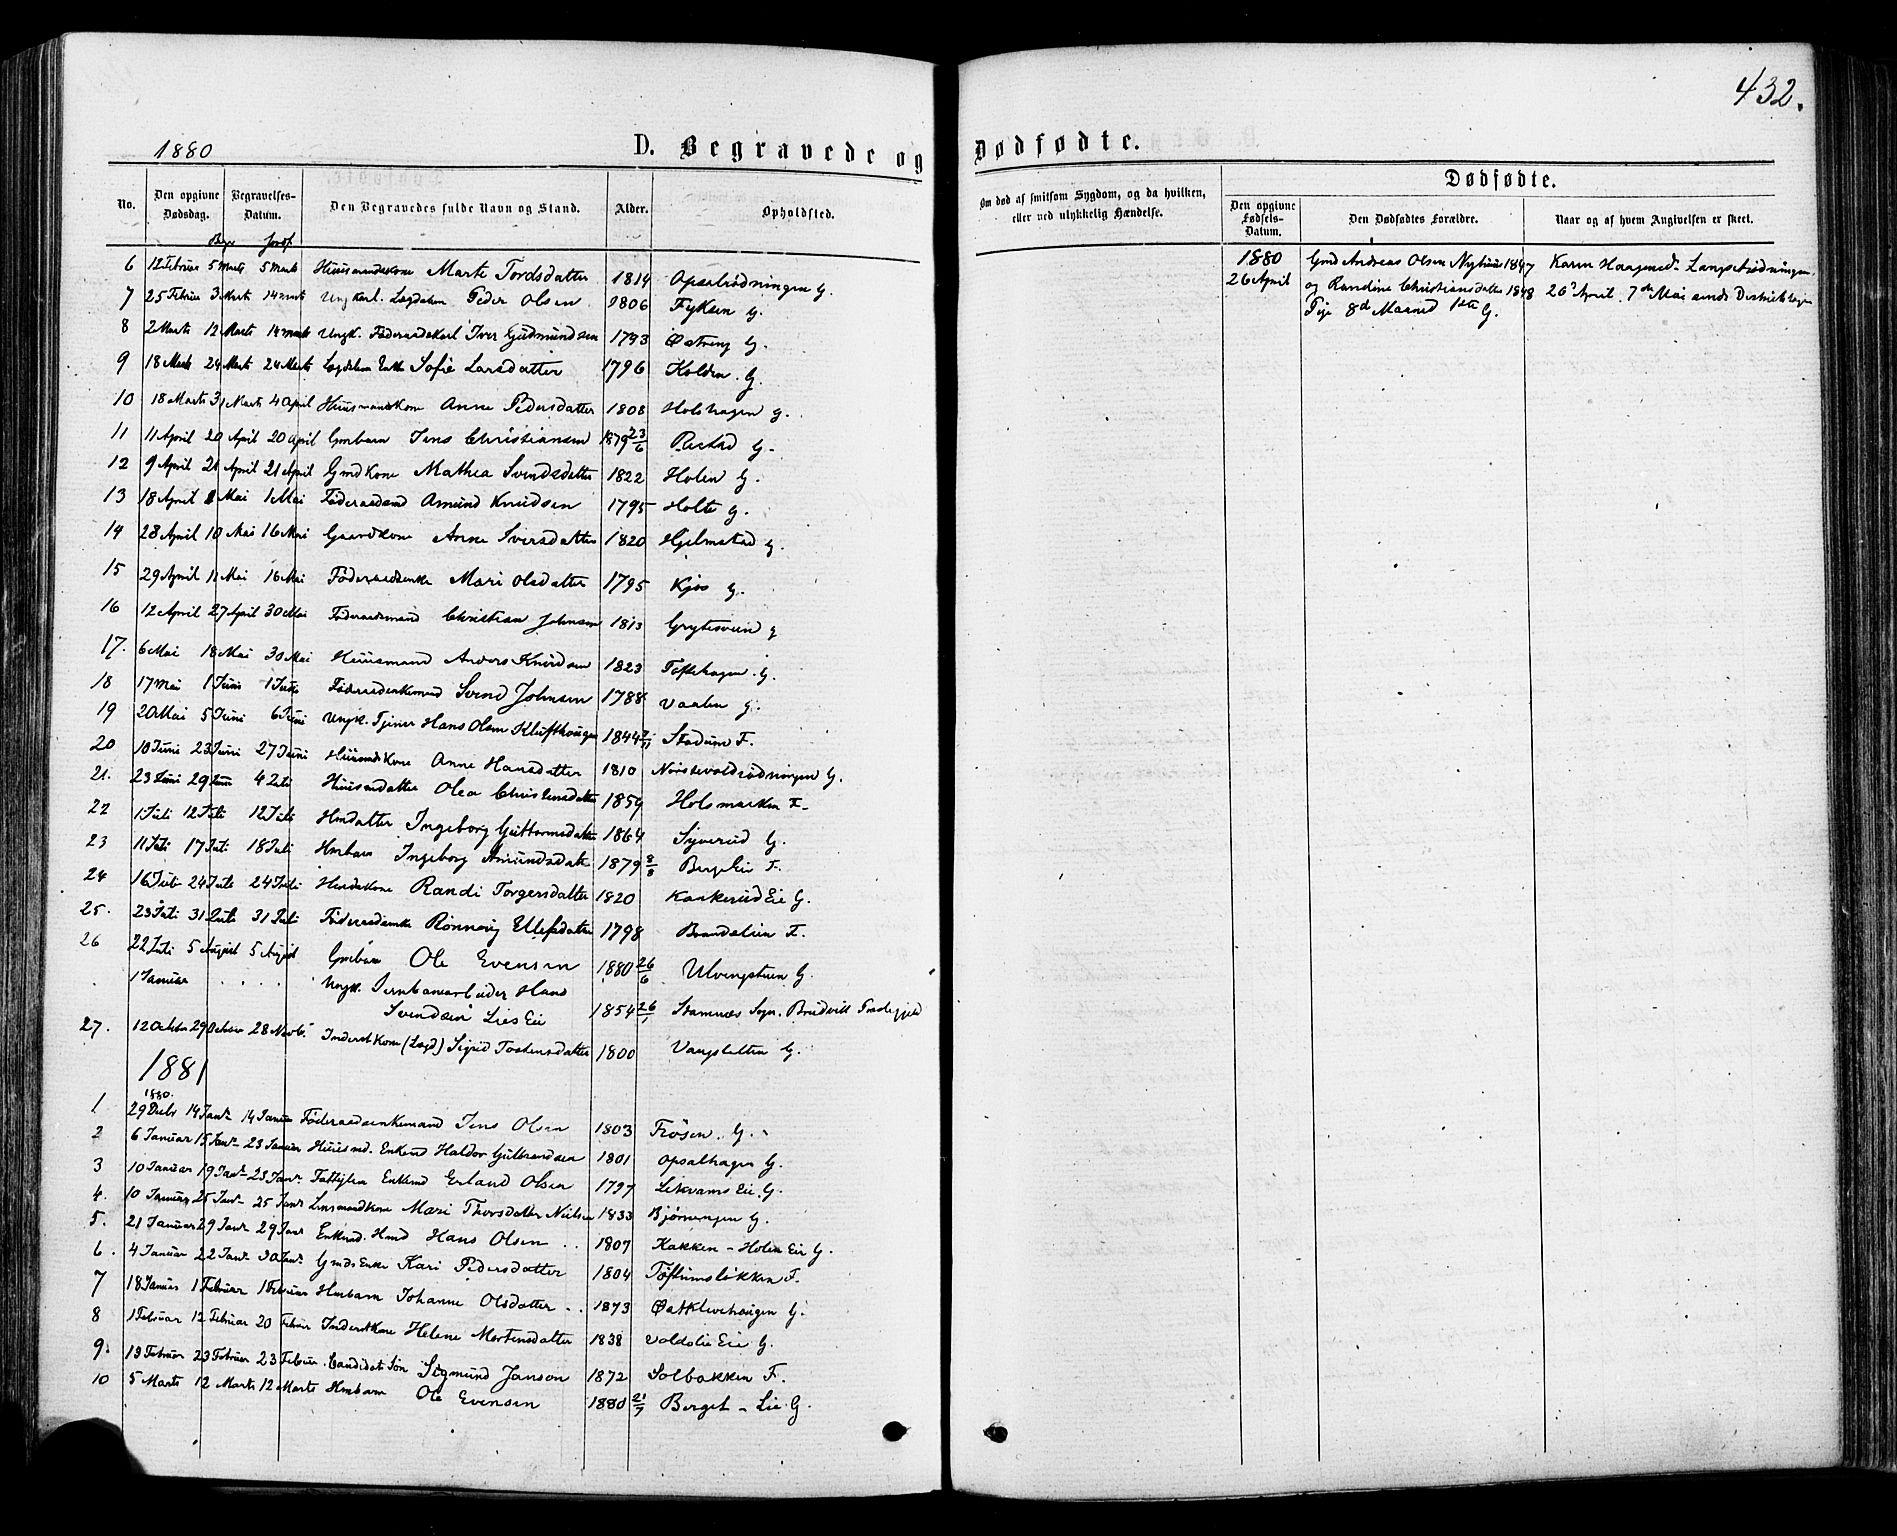 SAH, Østre Gausdal prestekontor, Ministerialbok nr. 1, 1874-1886, s. 432